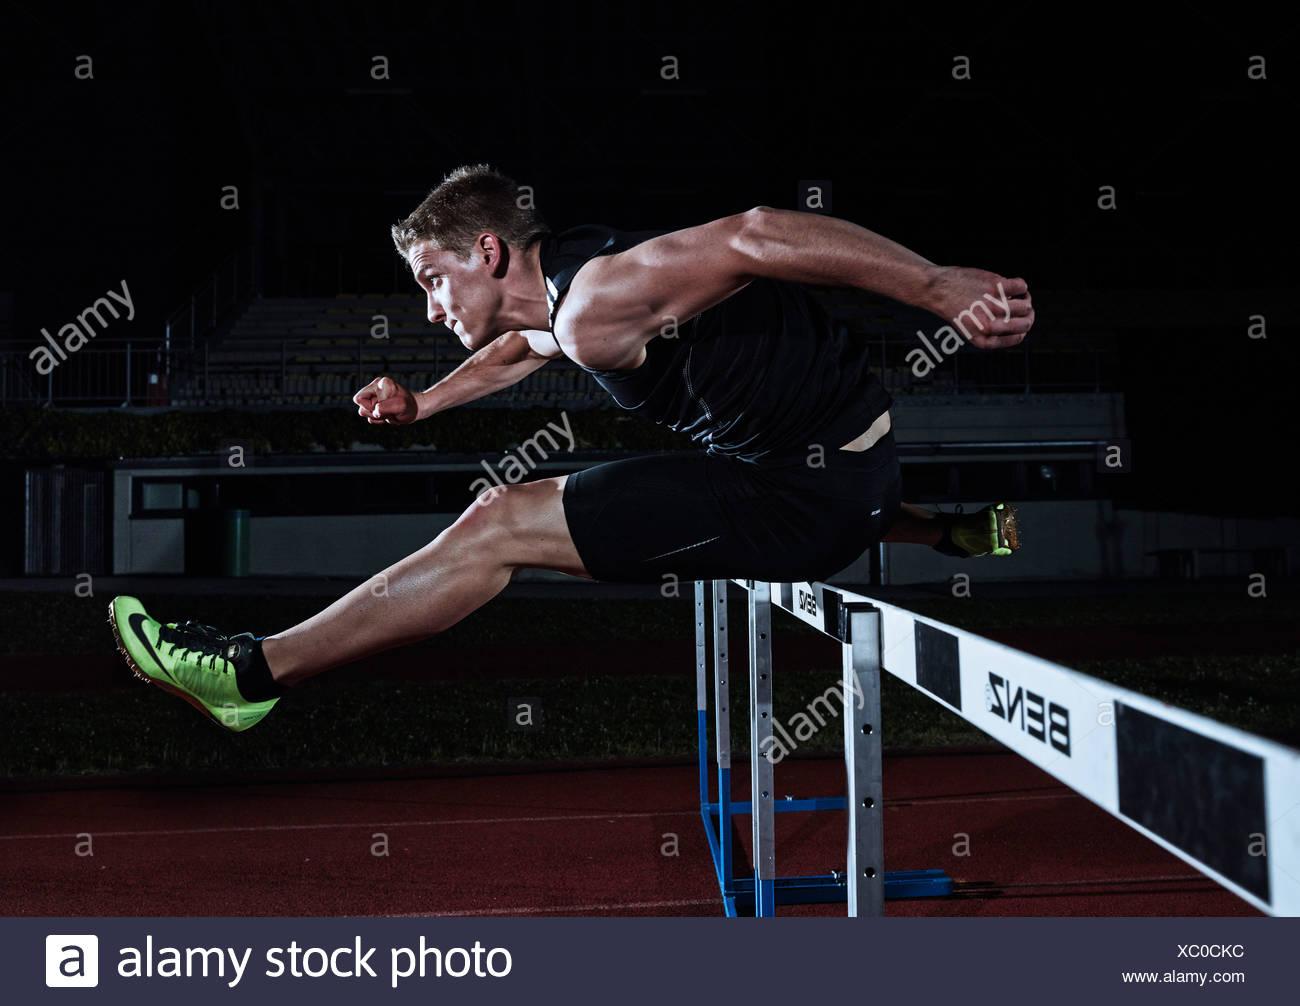 Hurdle racing athlete - Stock Image